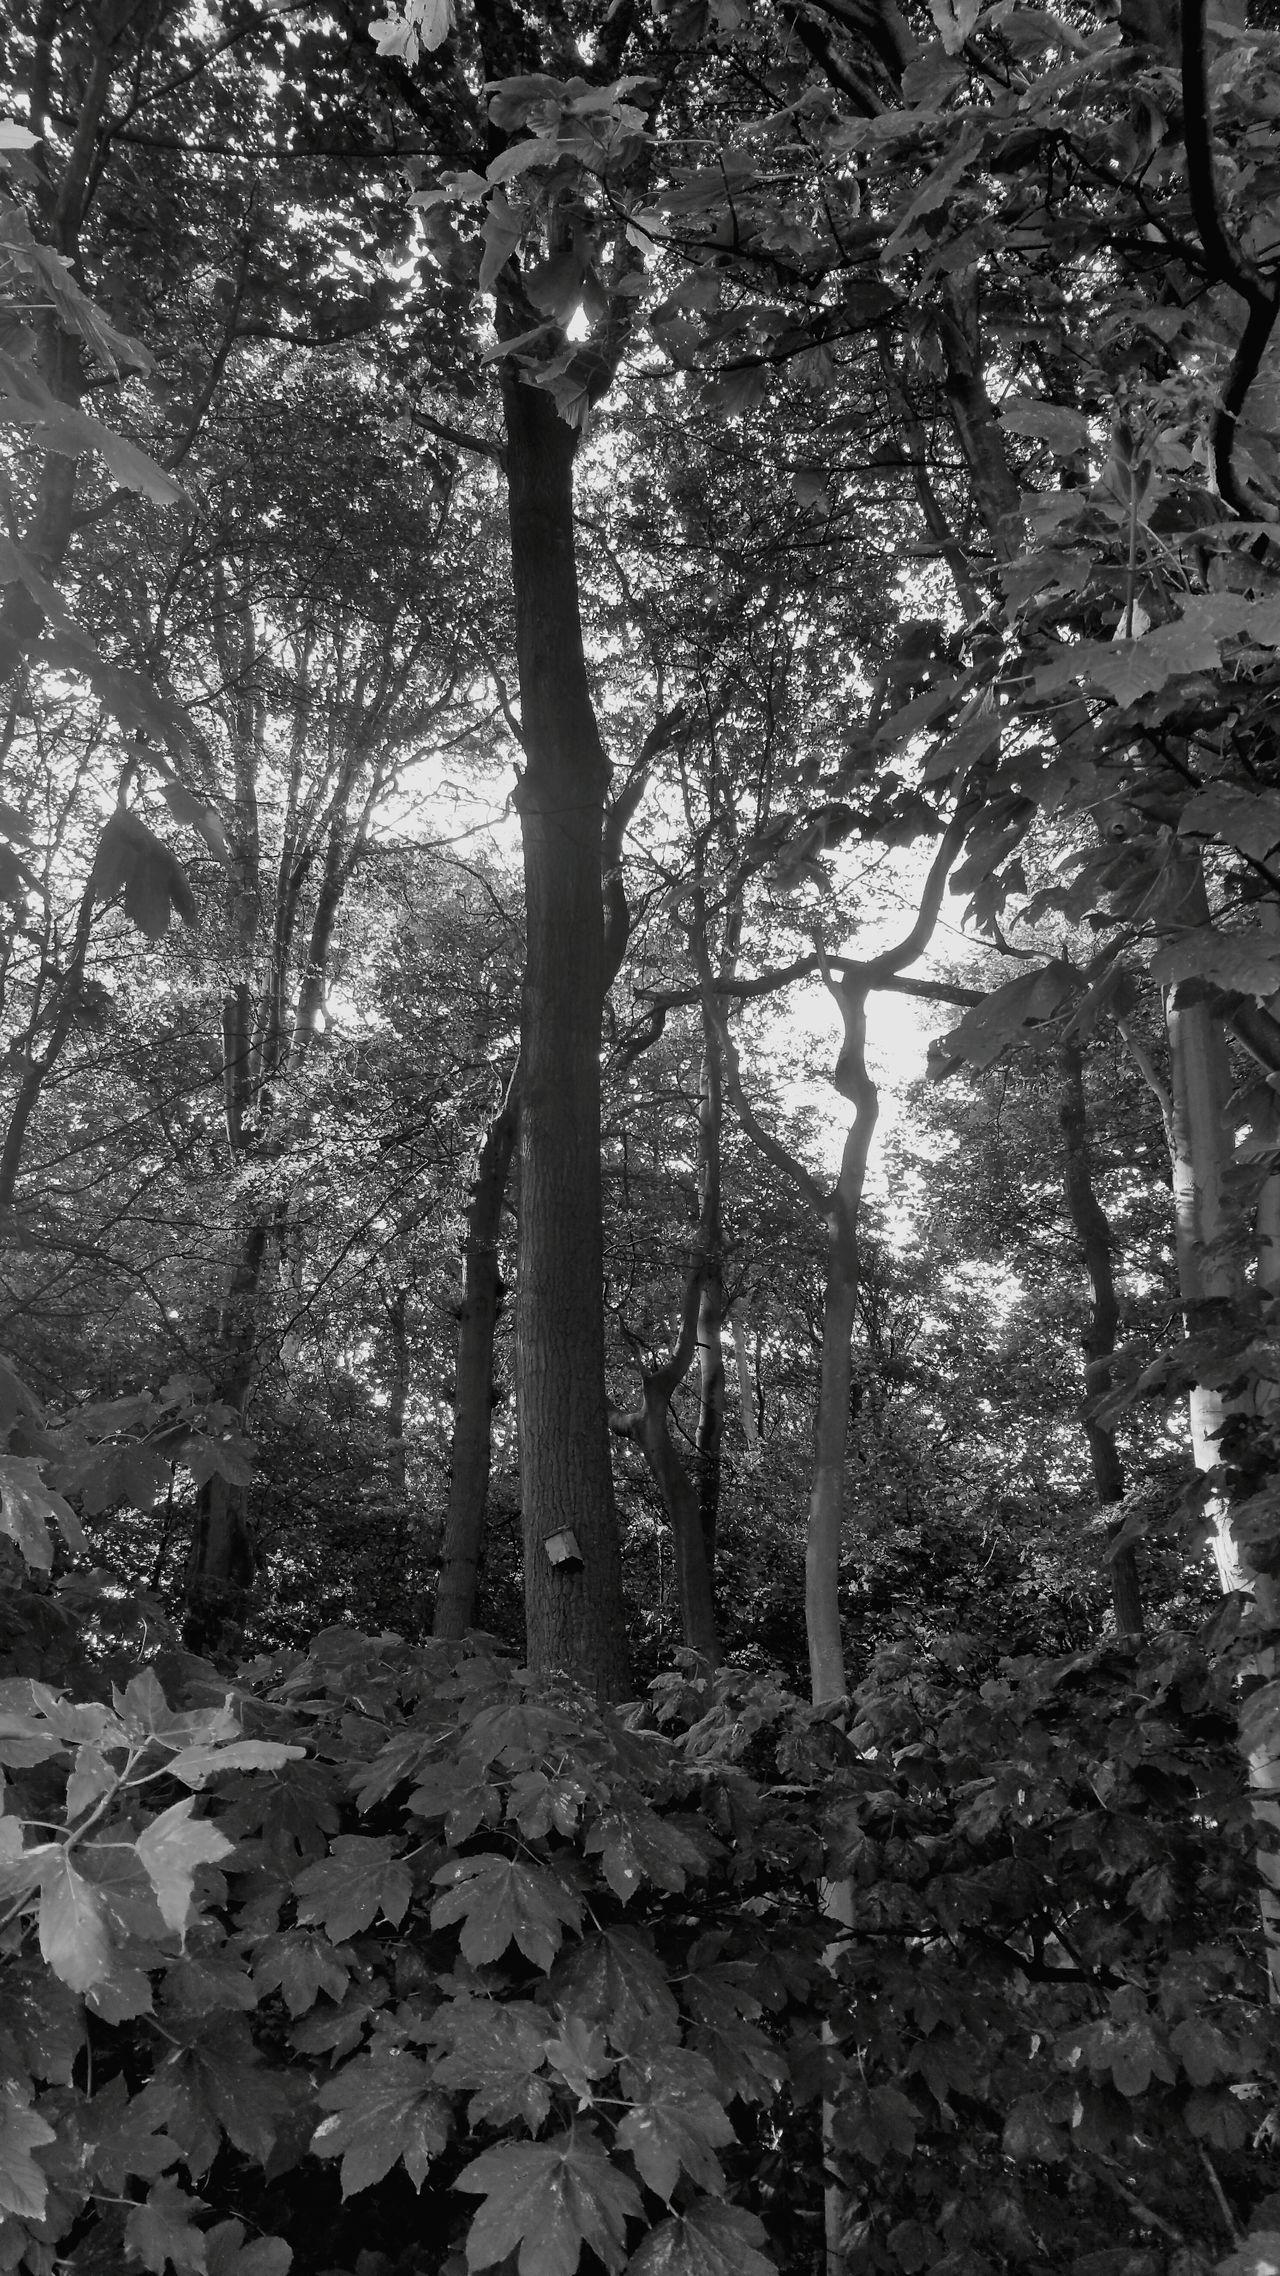 TreePorn Tree Art Treetastic Landscape #Nature #photography